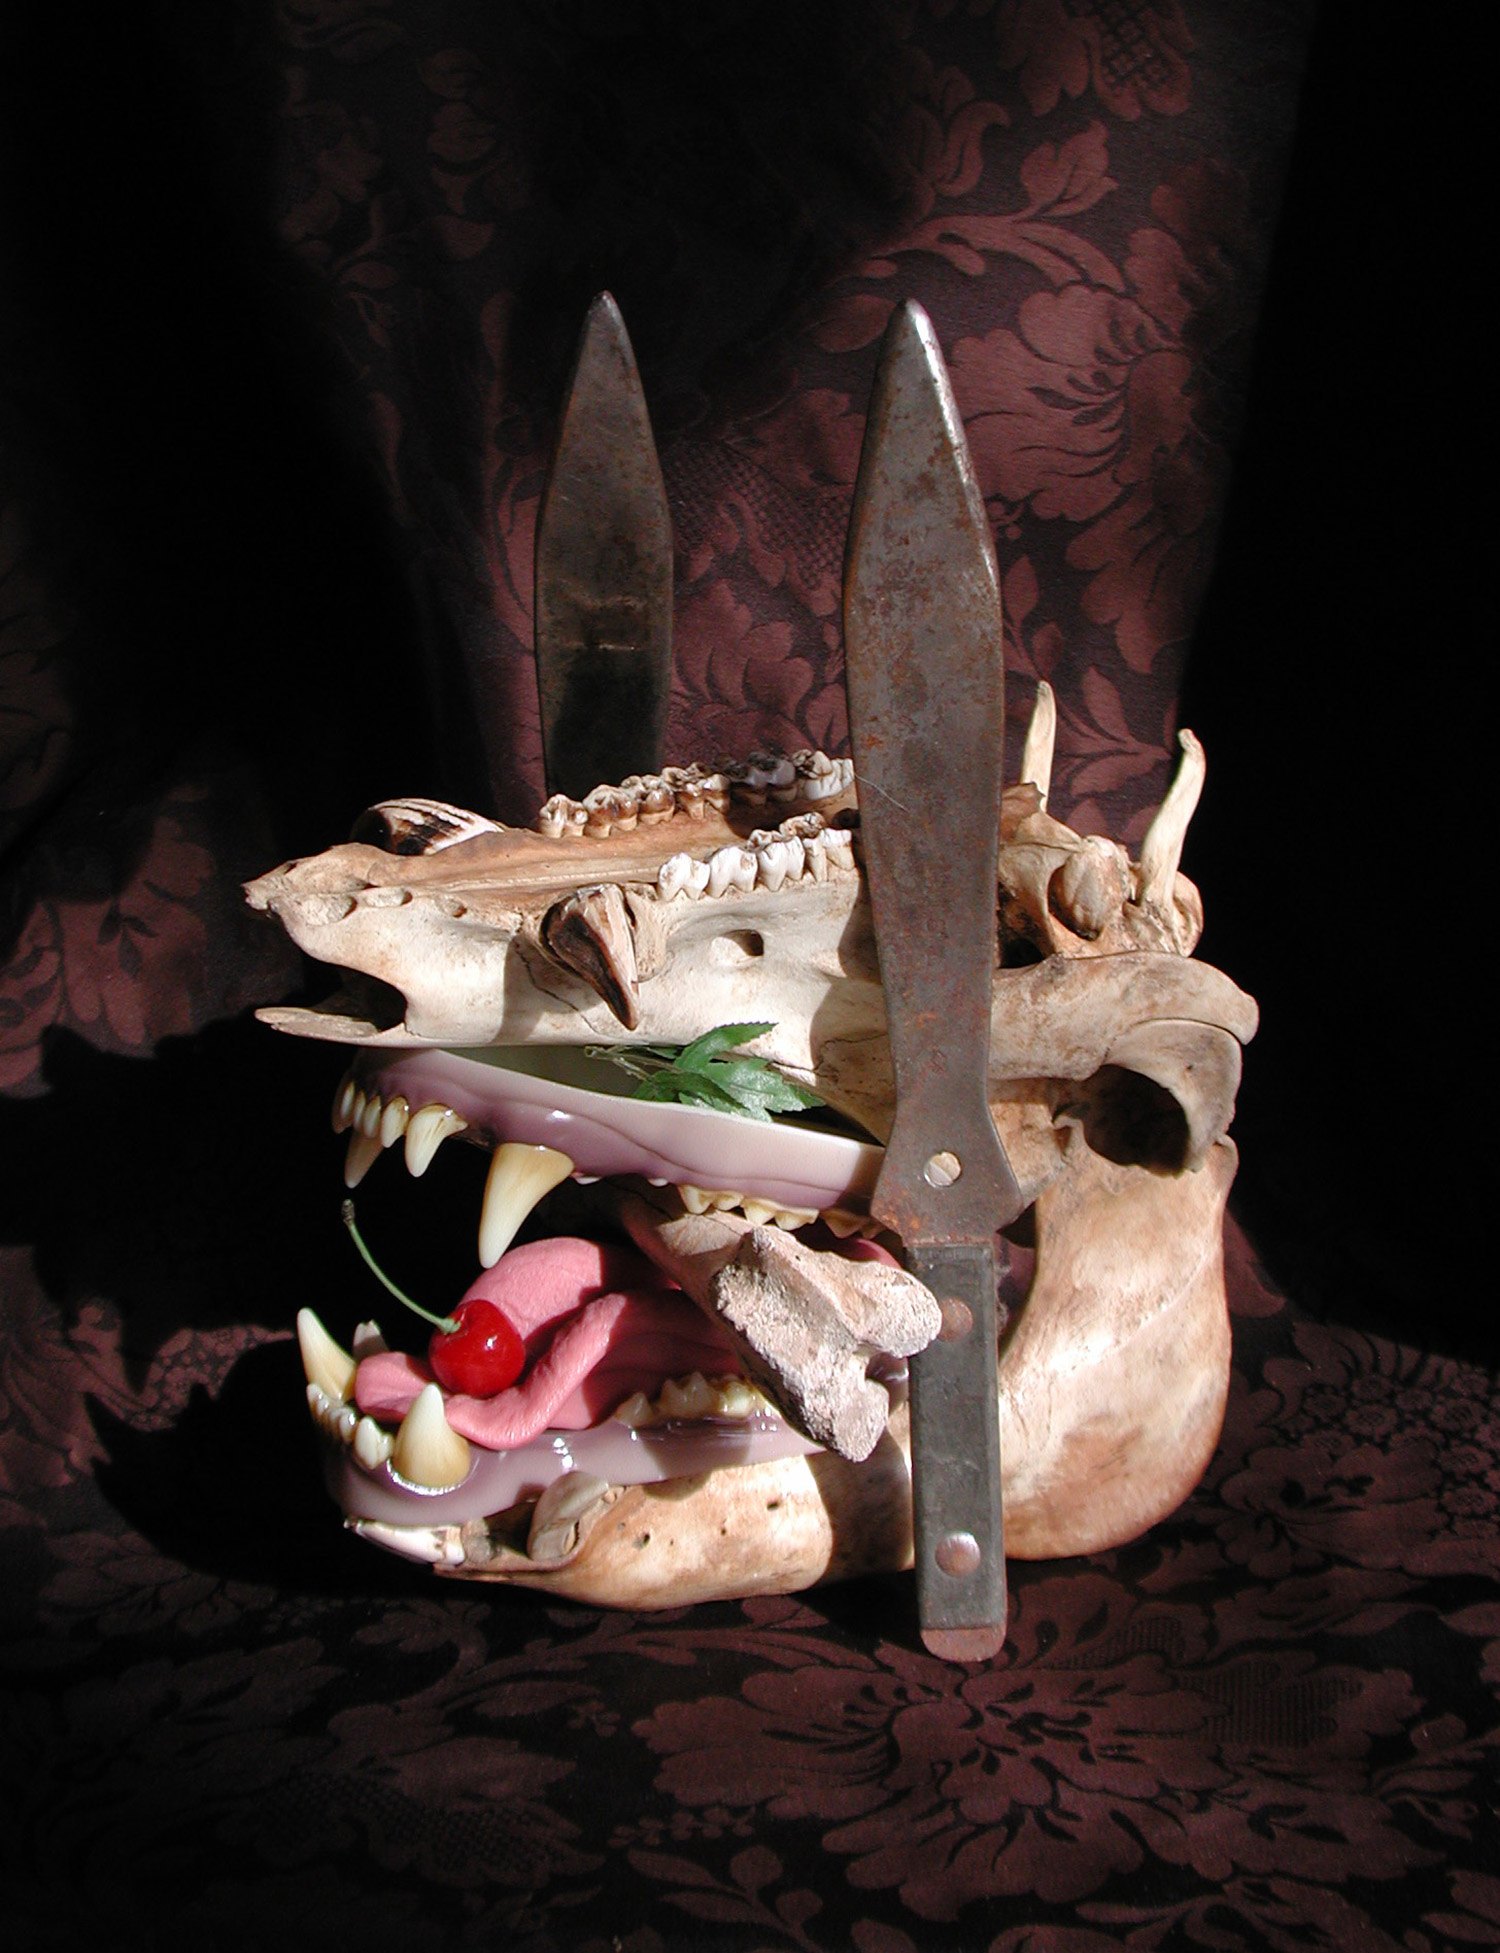 Scott Hove, Cake Fangs - pig tooth cake